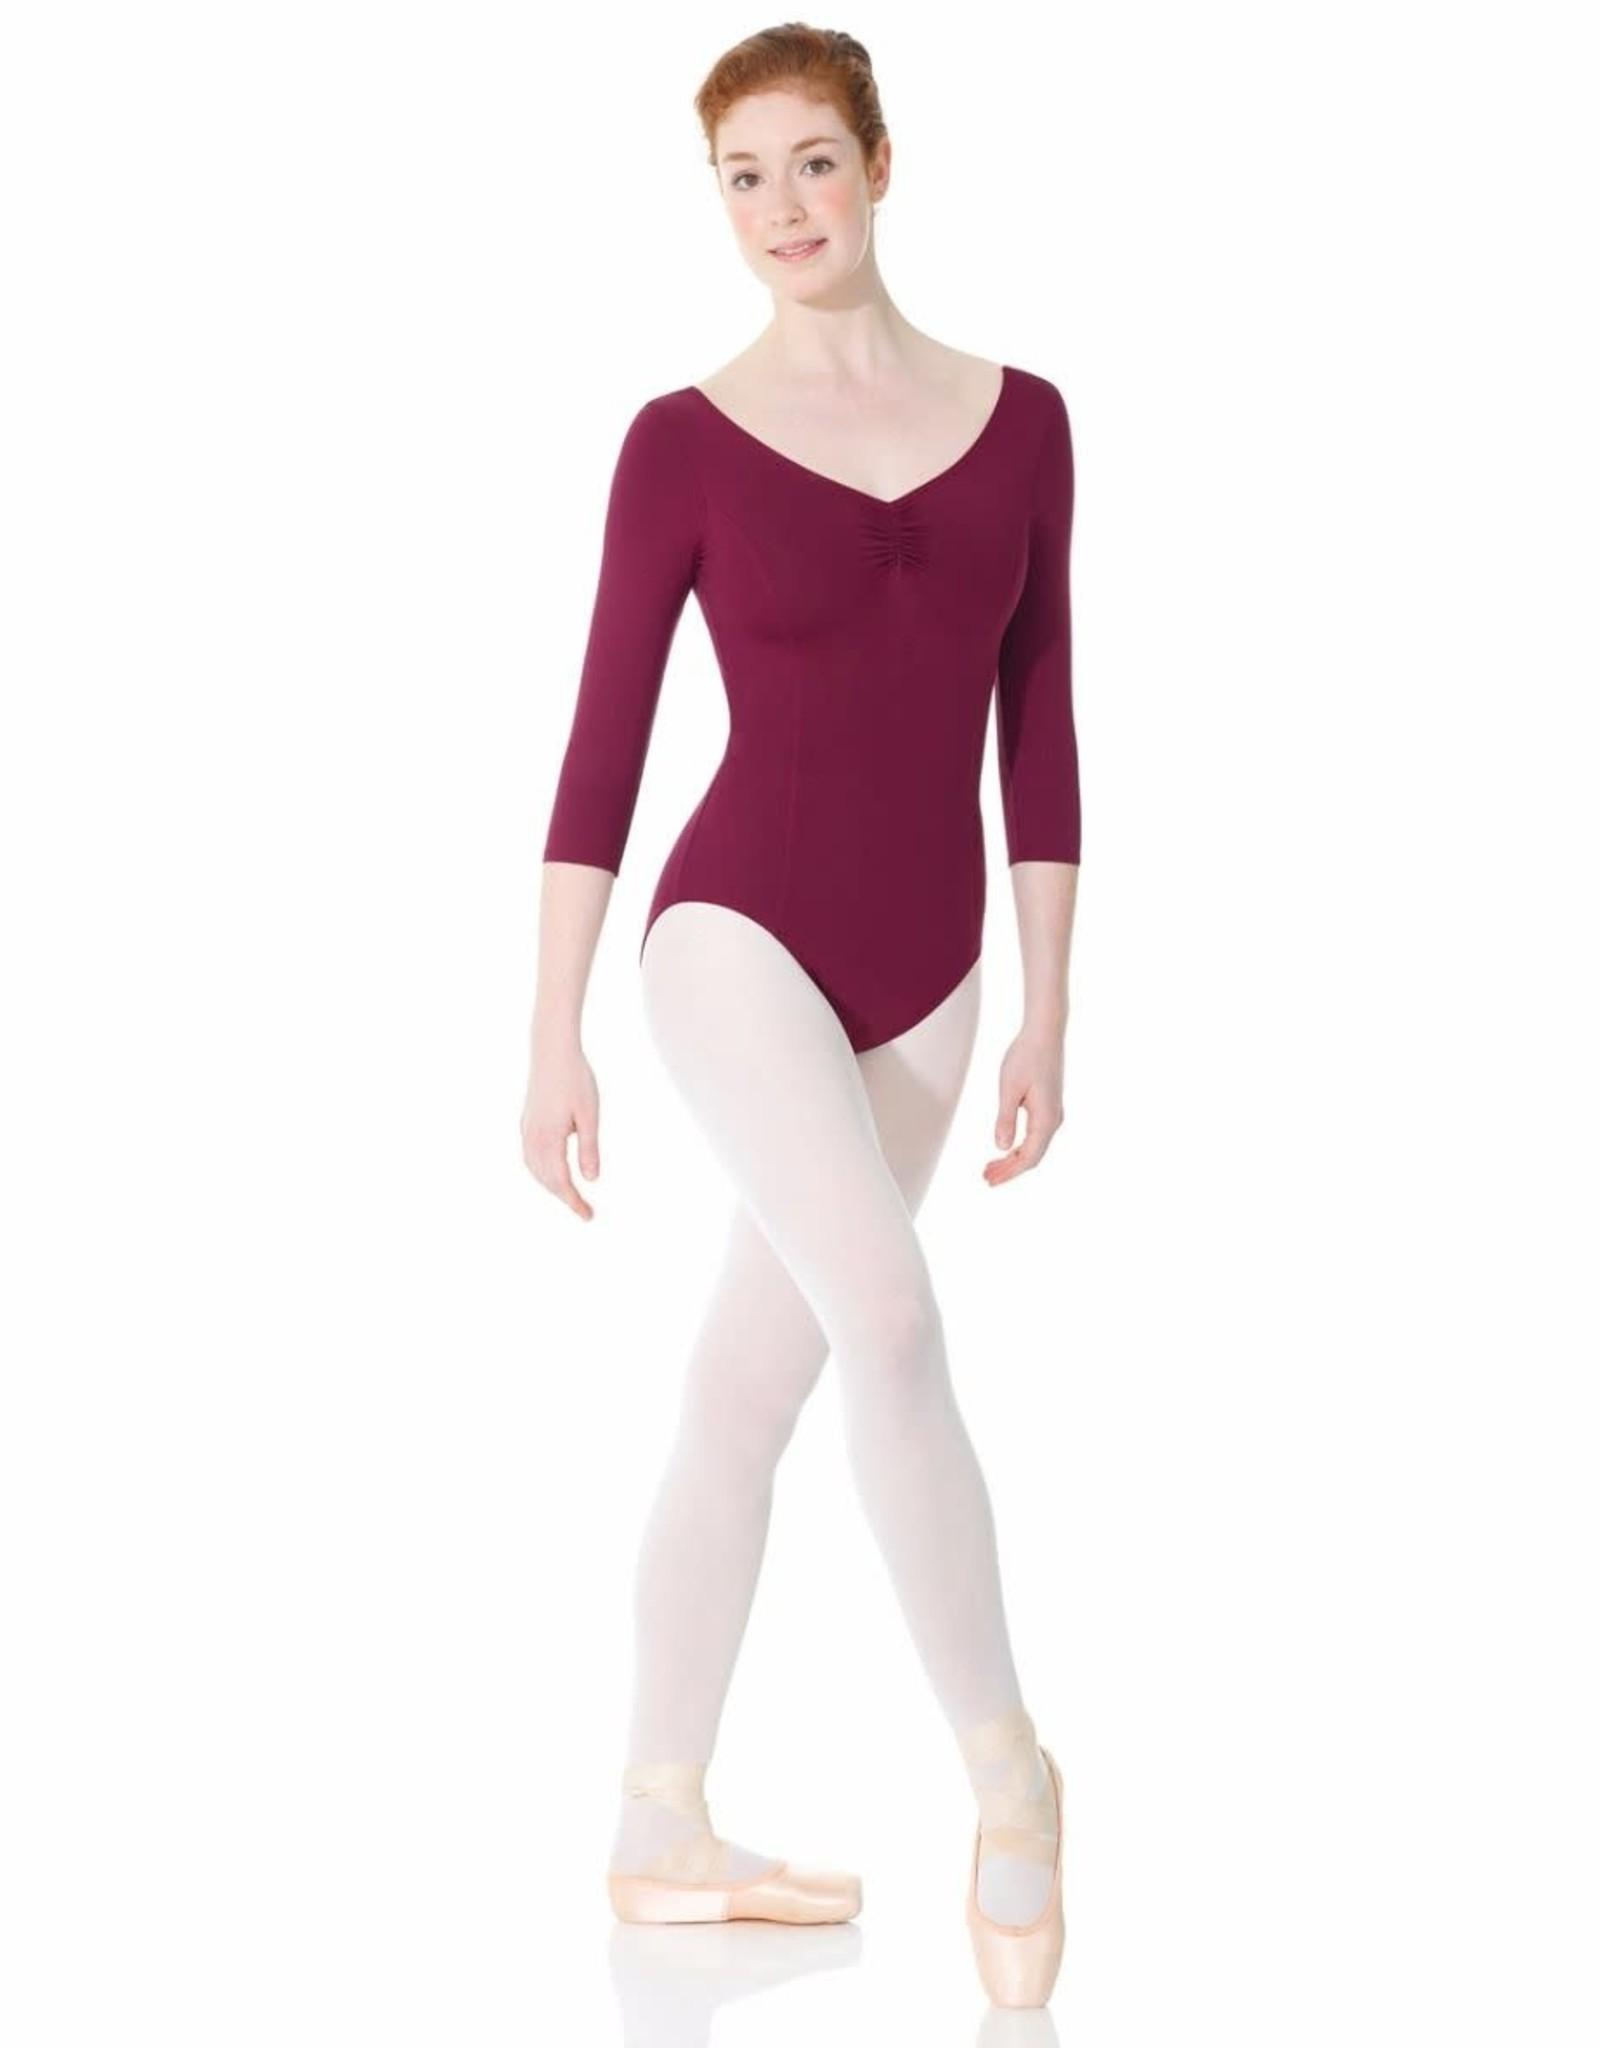 Mondor Dance MAILLOT MANCHES LONGUES 3/4 AD